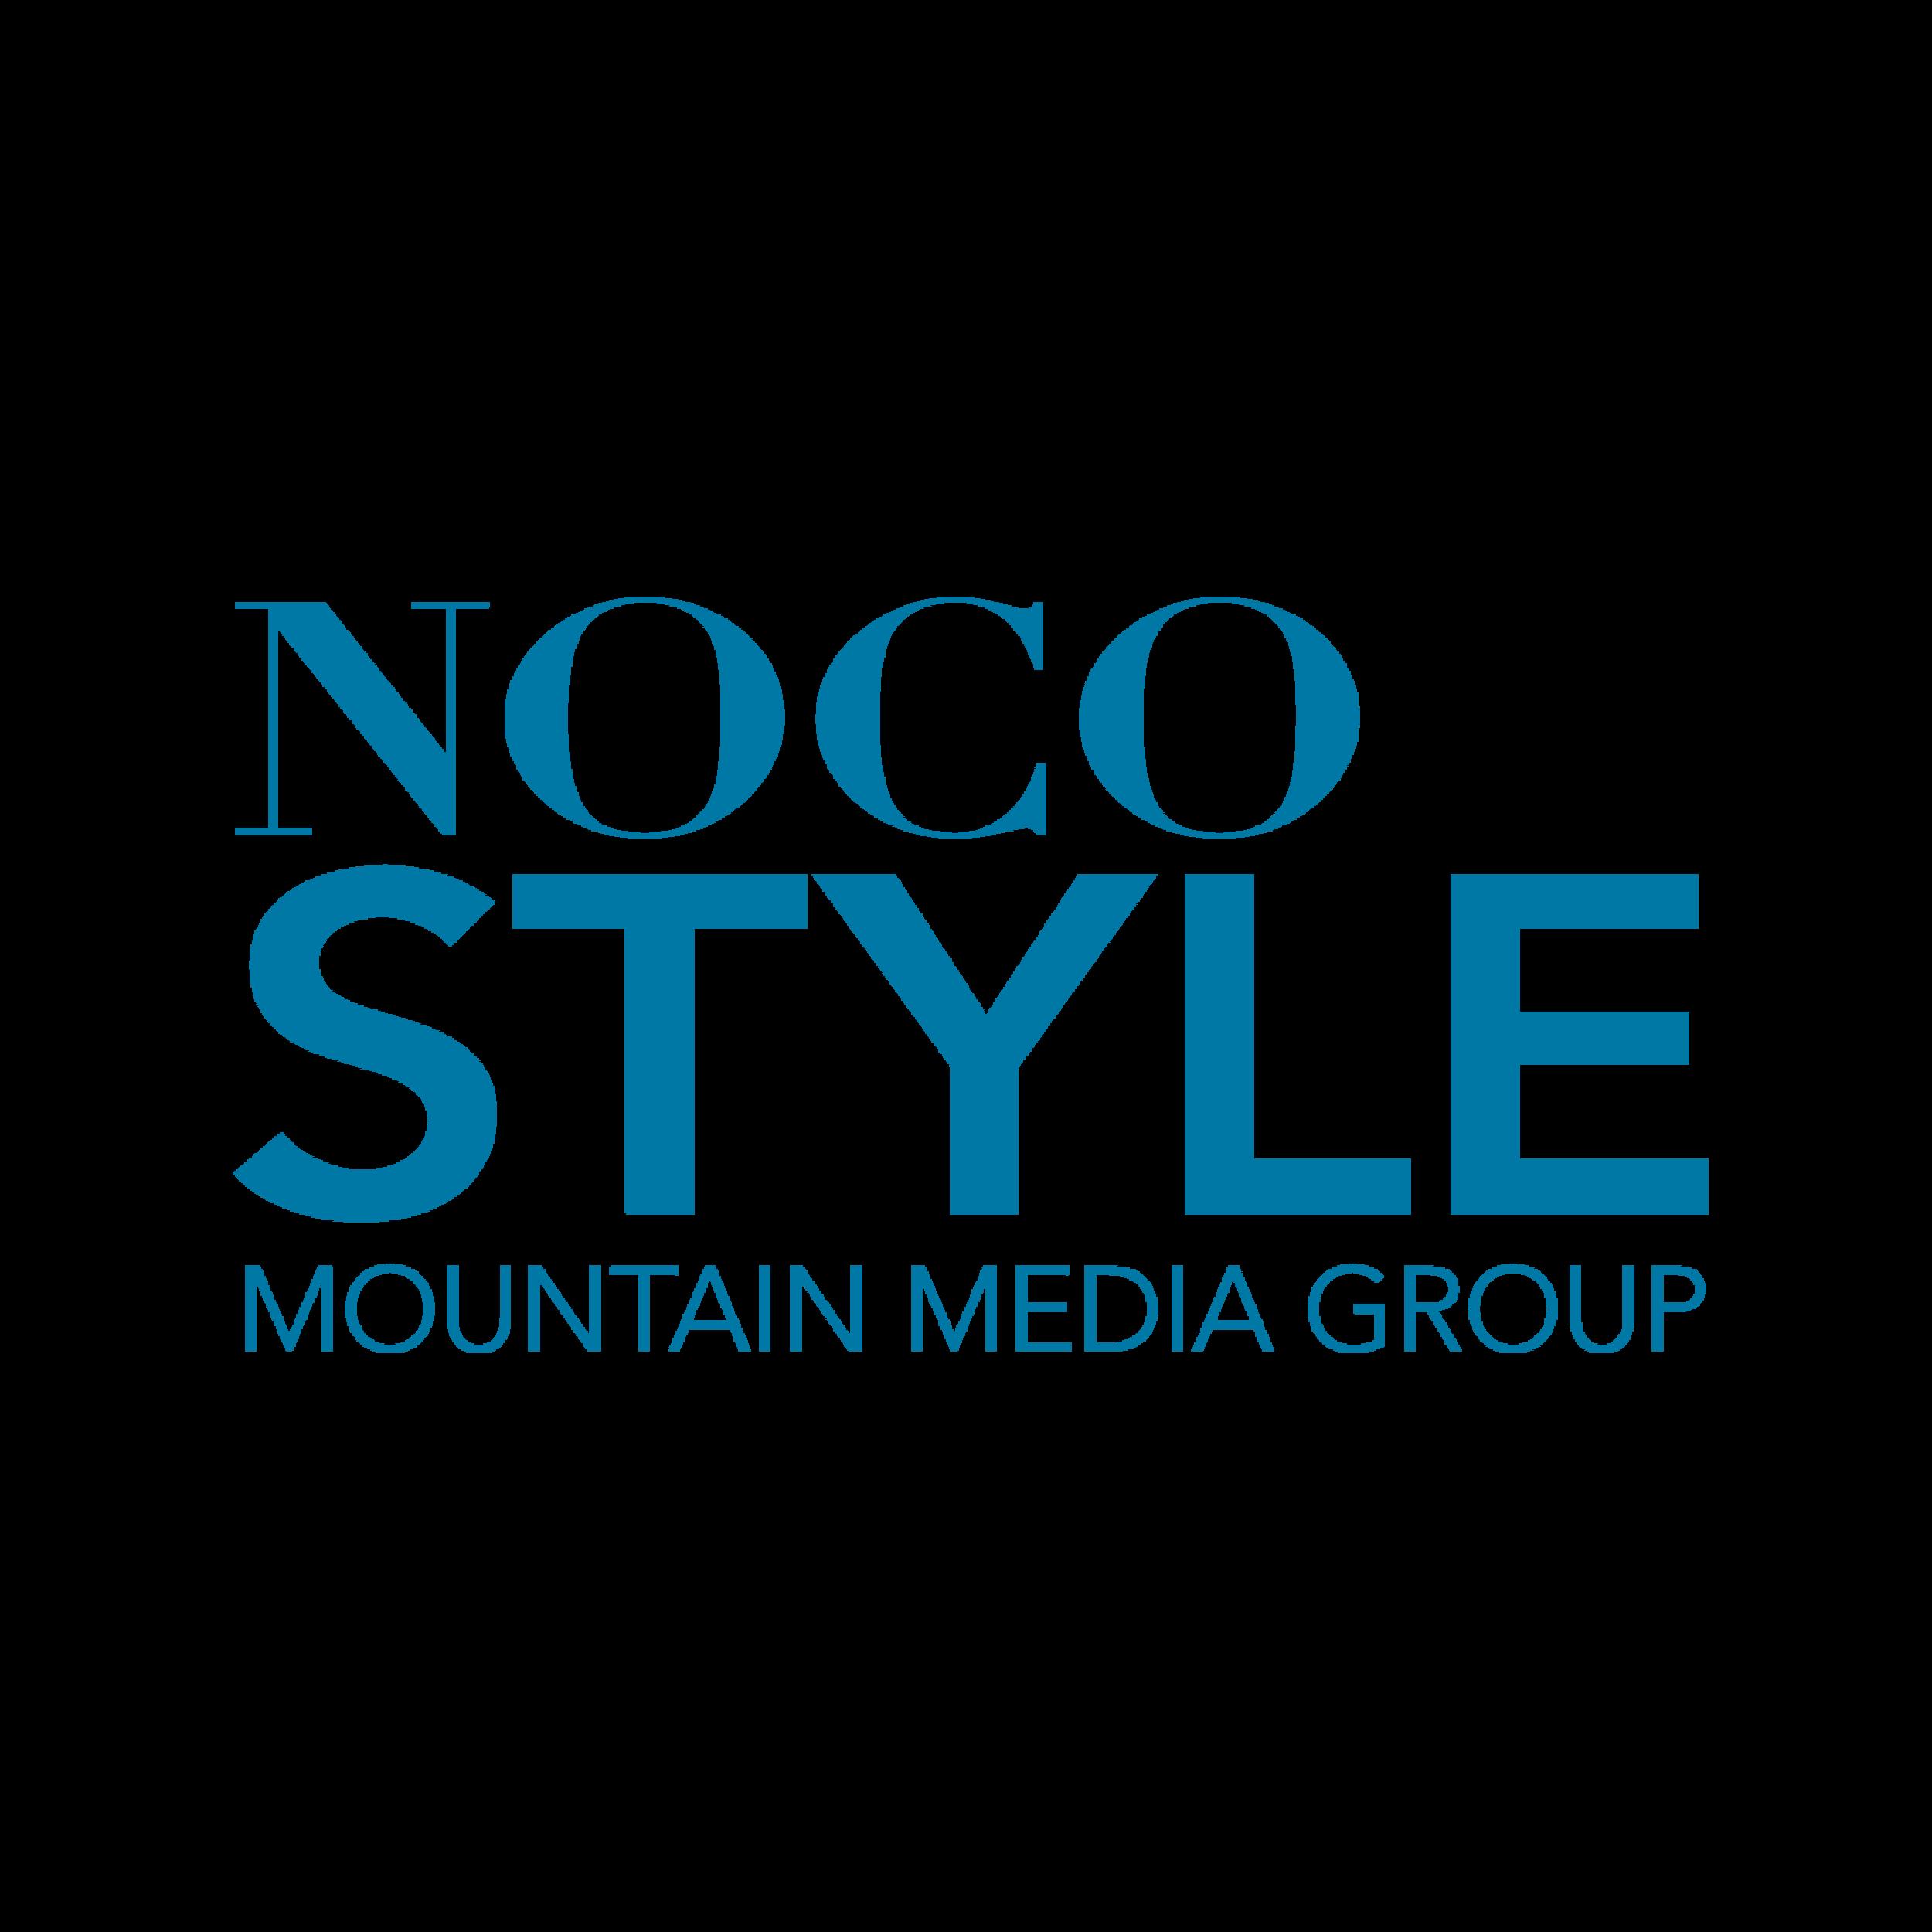 NOCO-STYLE-LOGO Mountain Media (1)-01.png